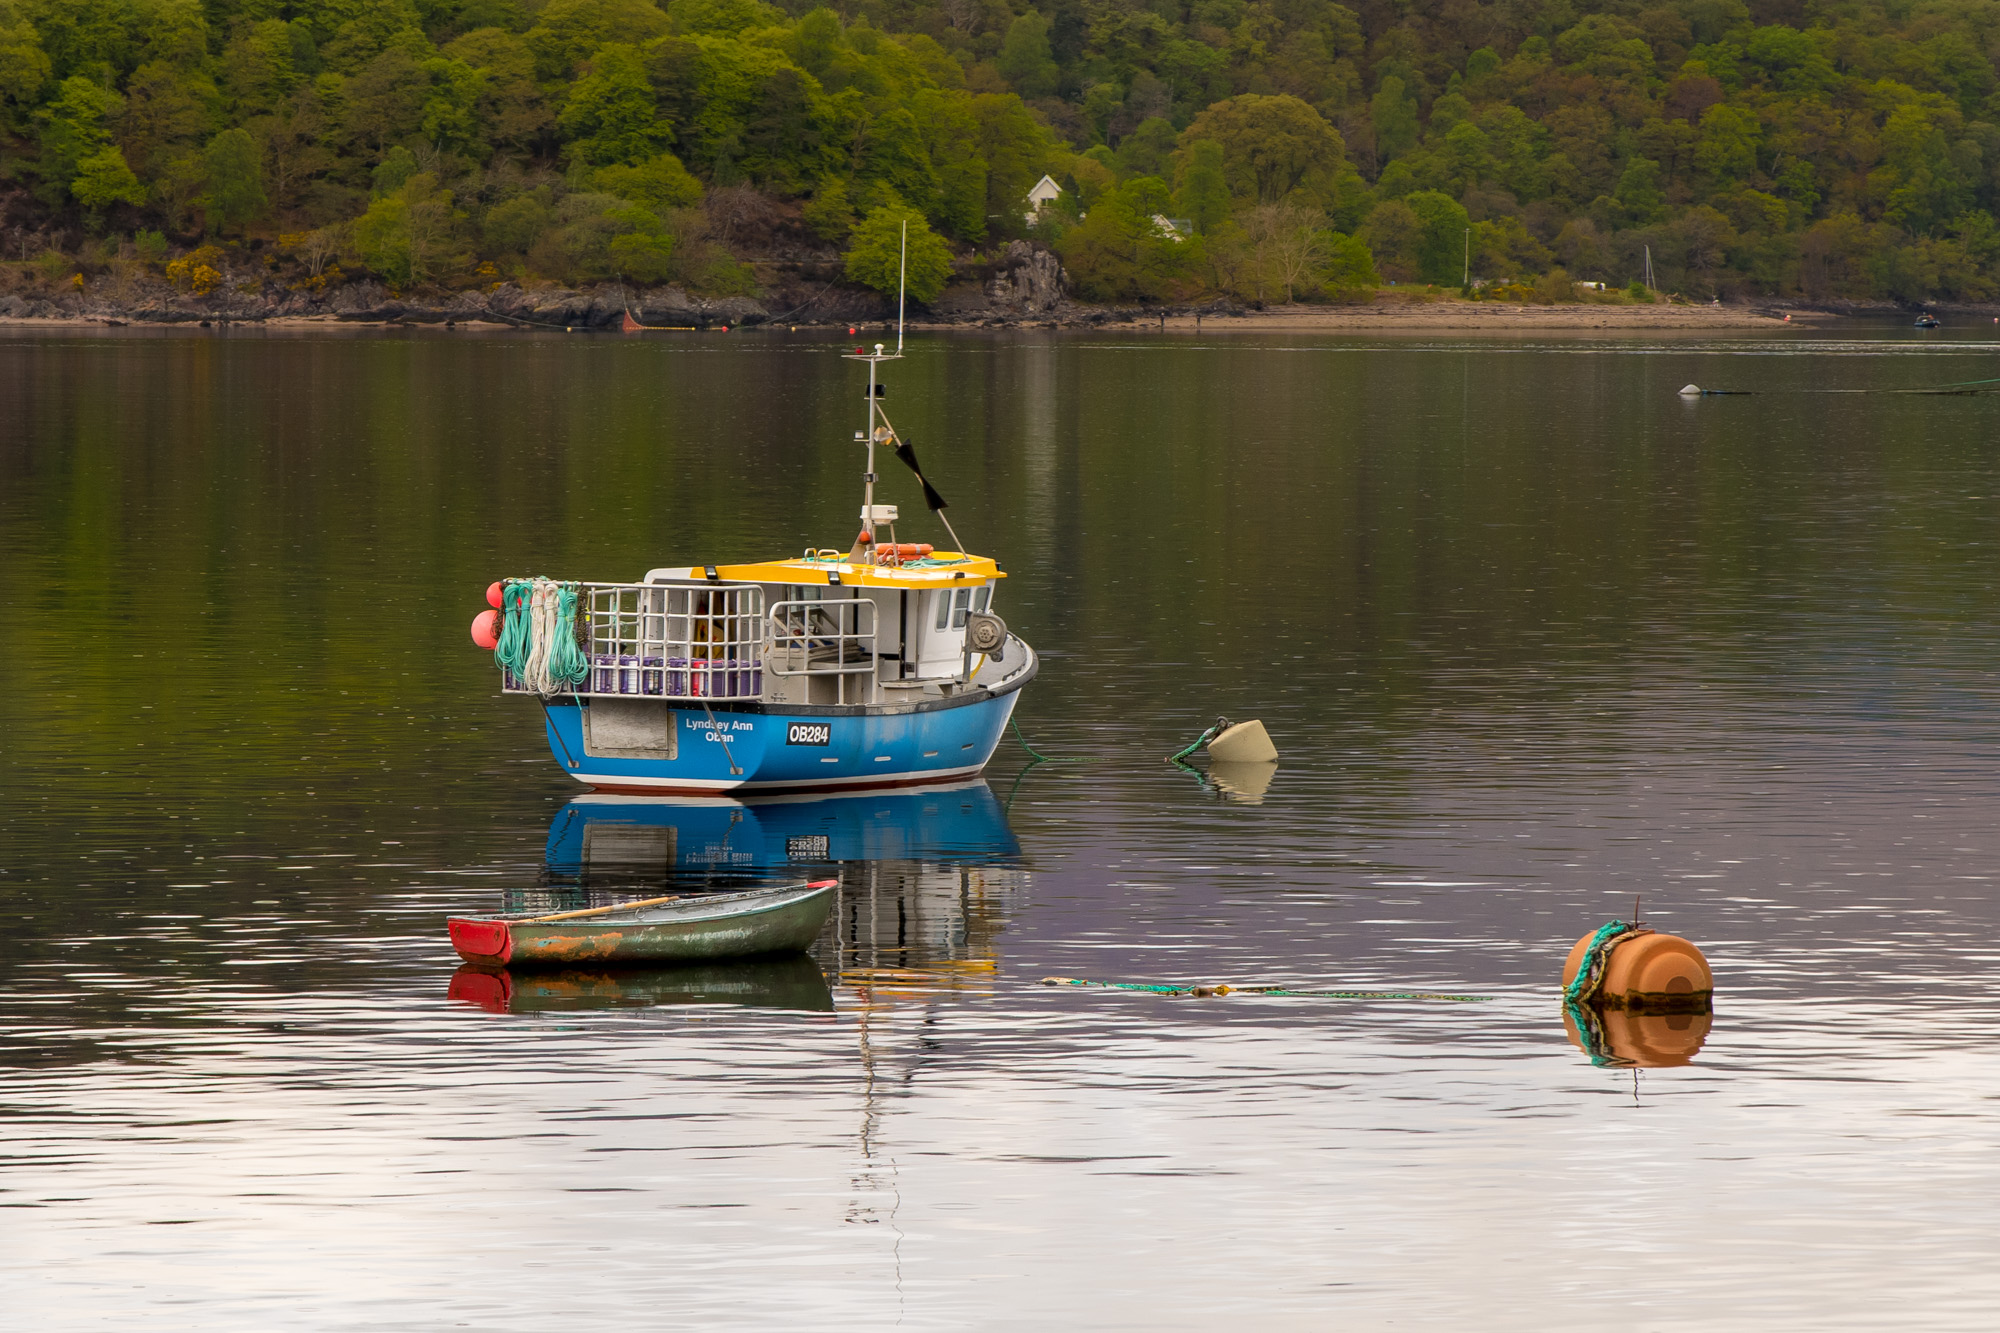 Peter Ocvirk: Ribiški čoln-Škotska